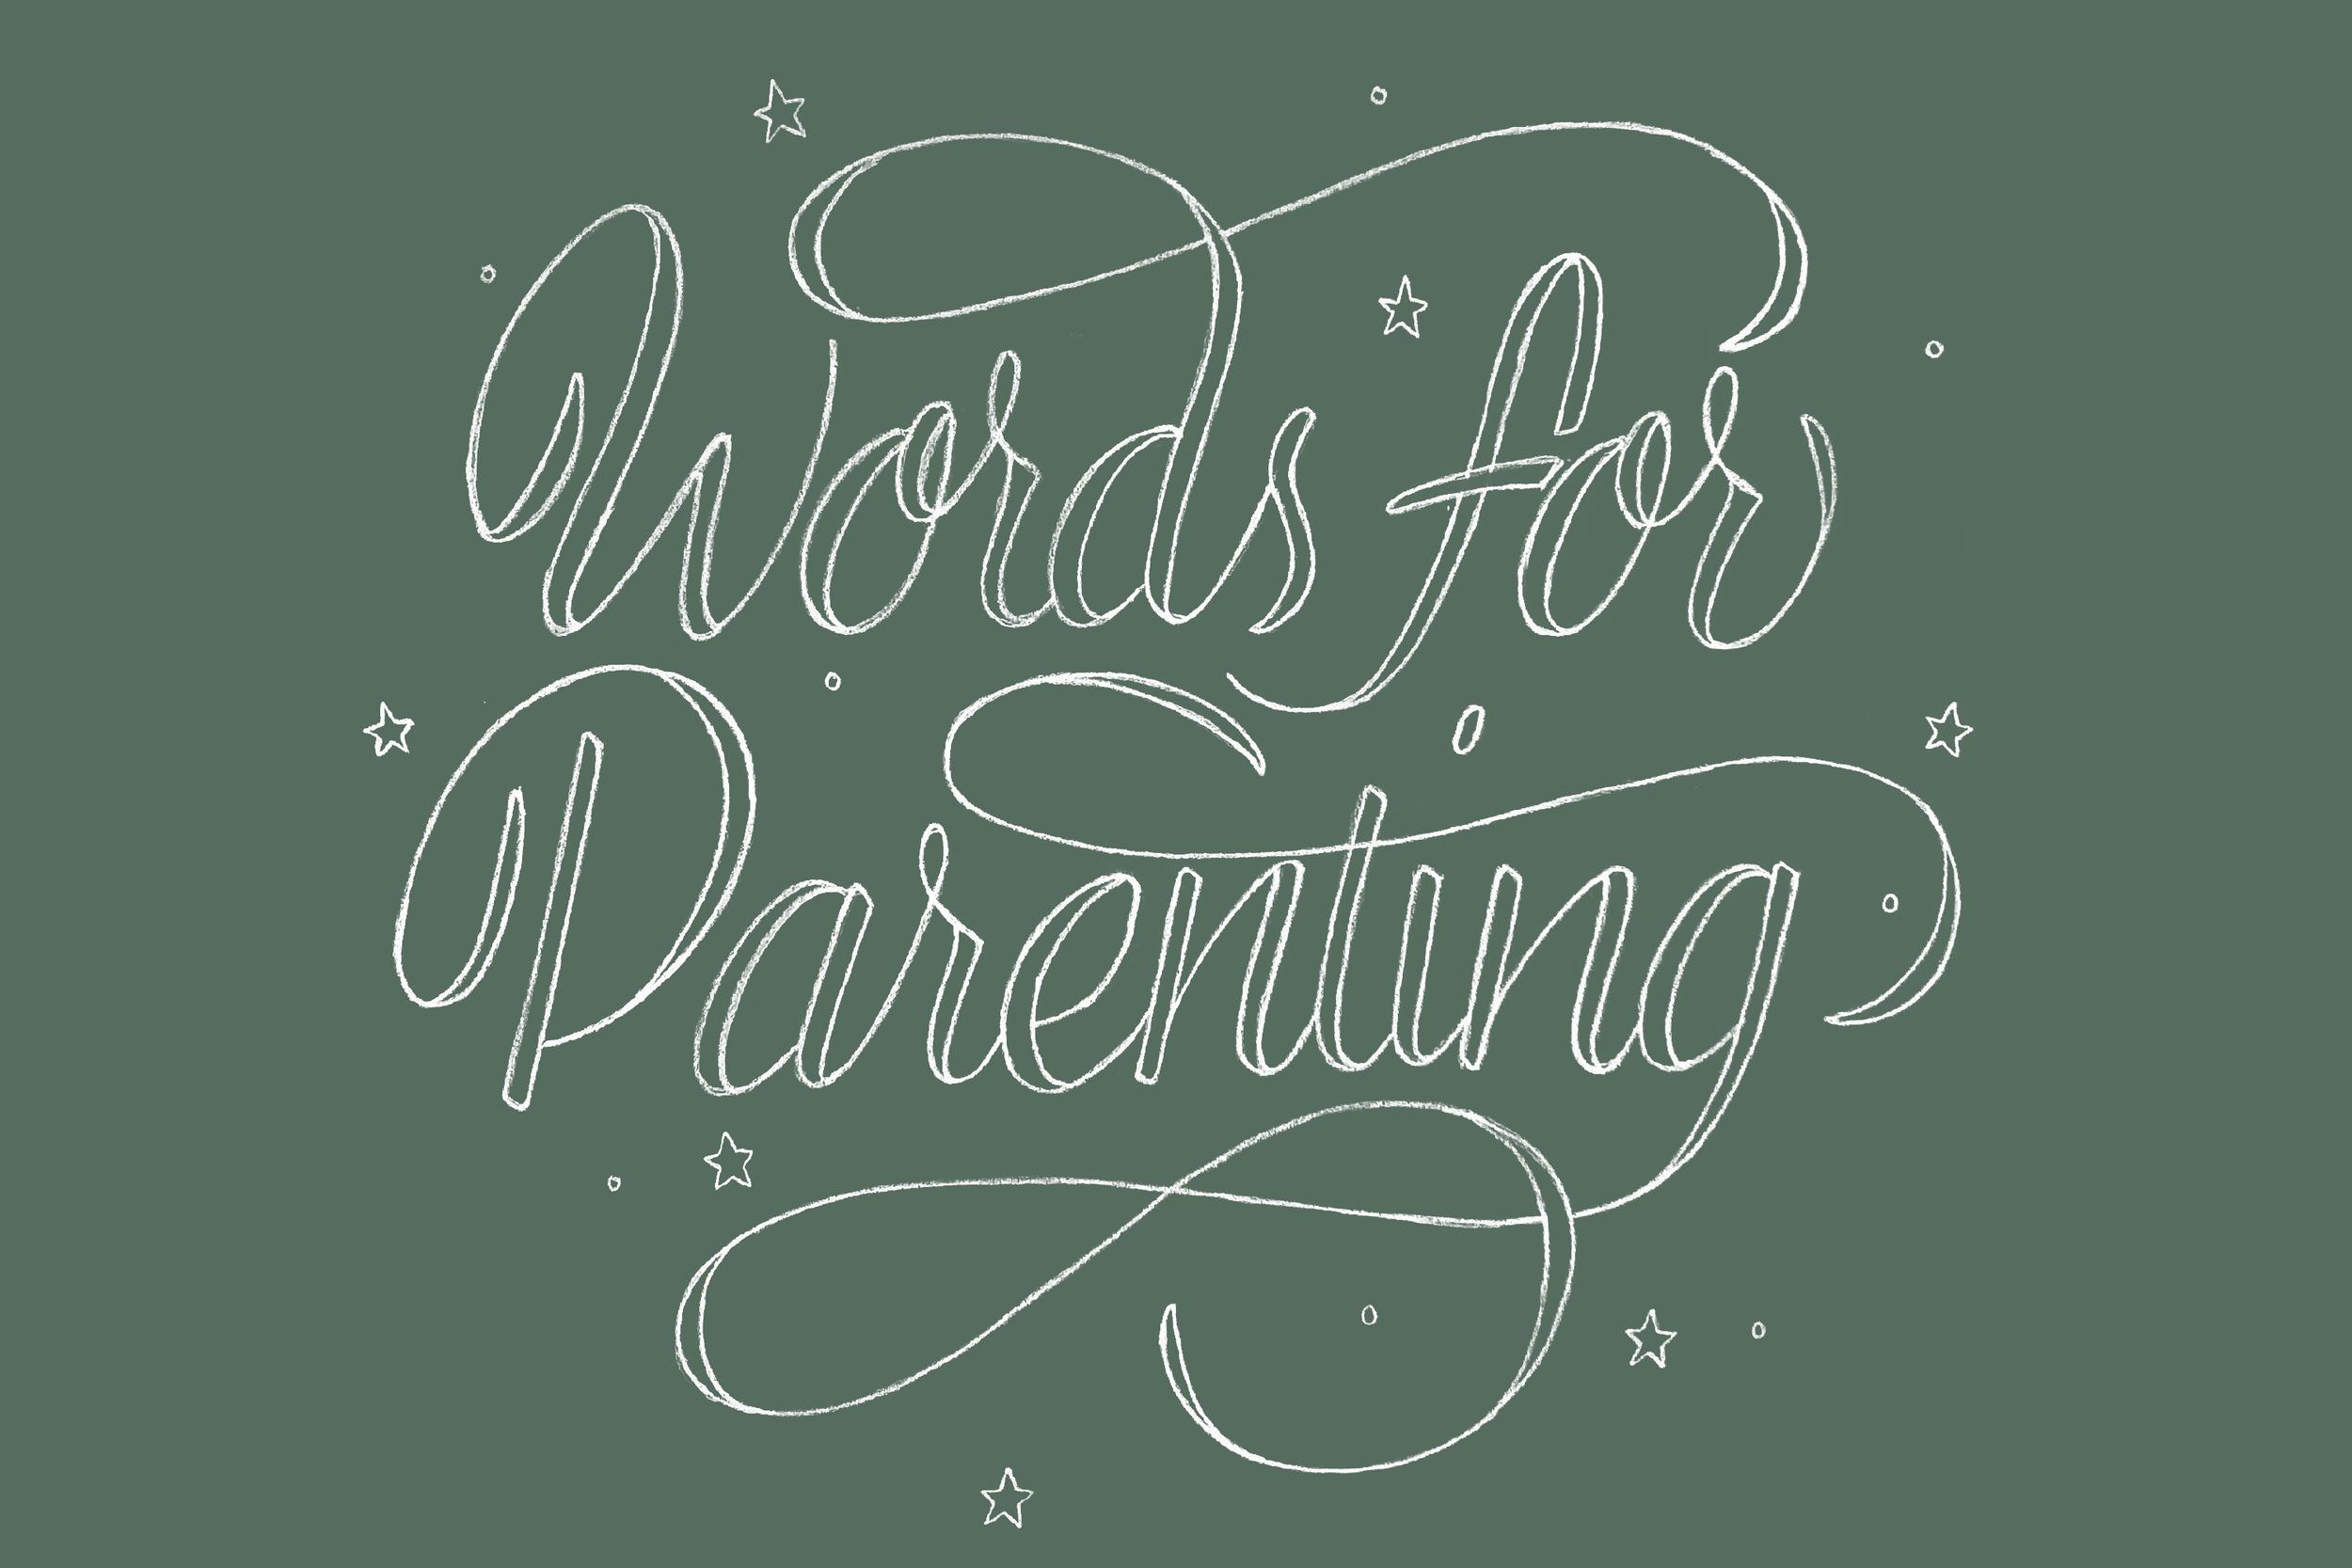 artwork_words for parenting.png